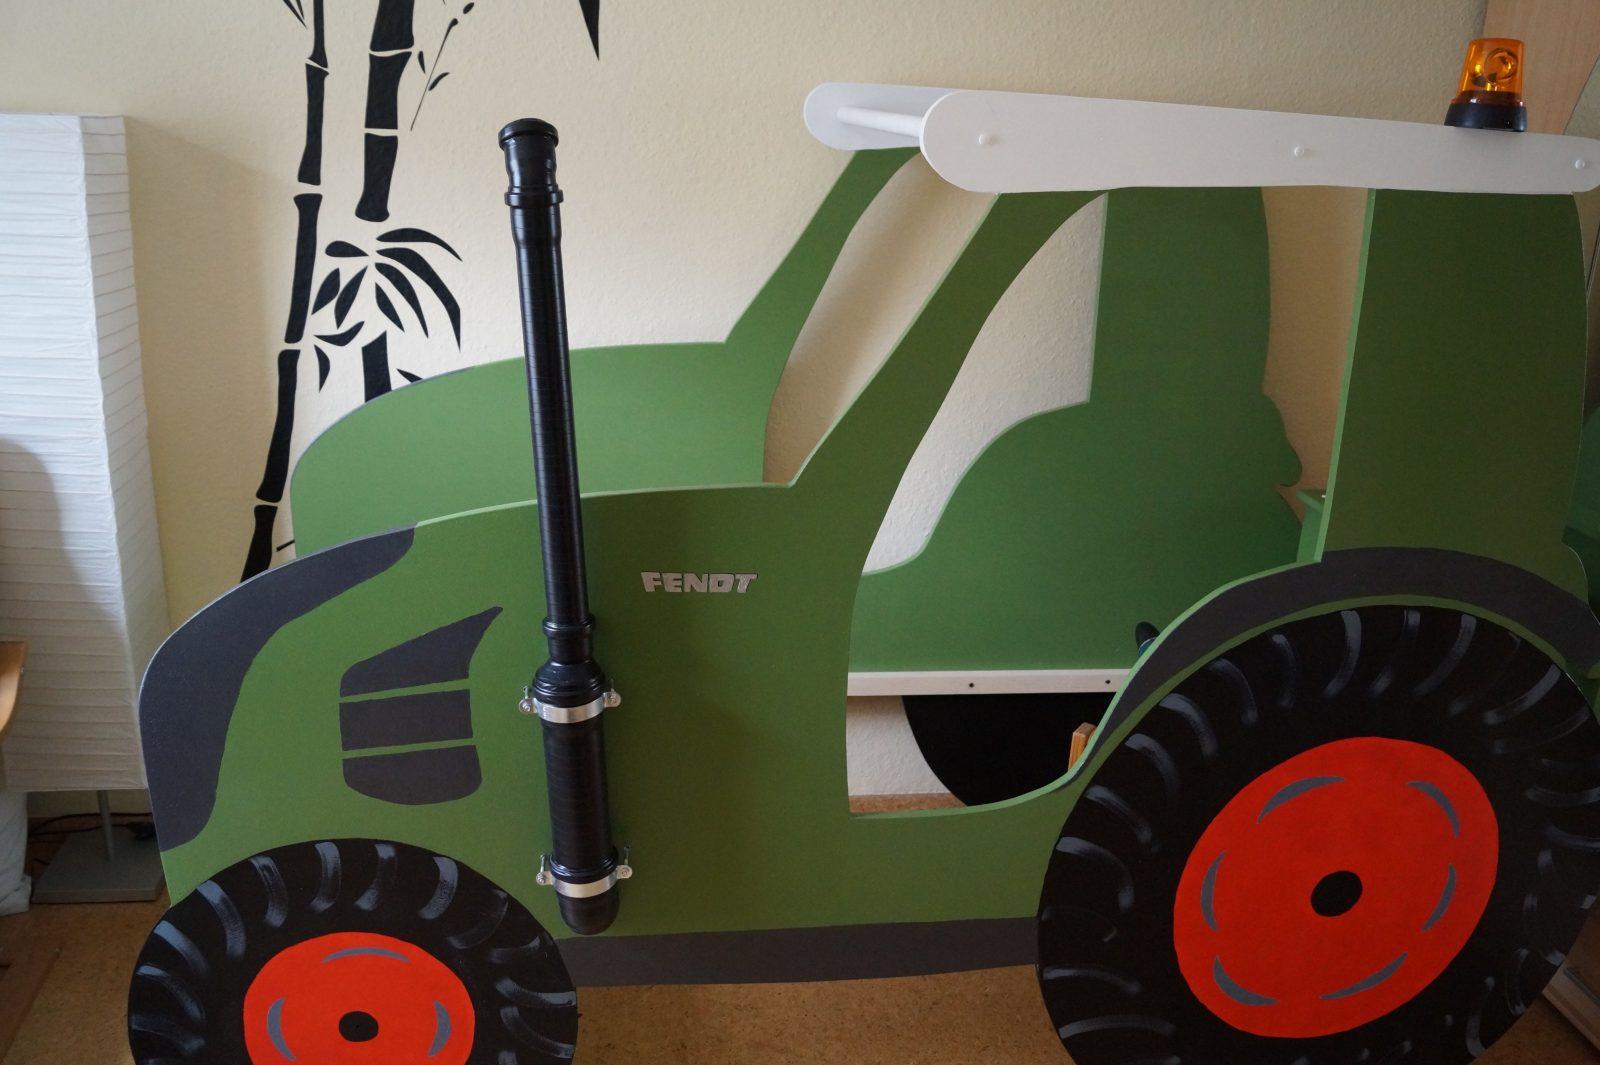 Traktor Kinderbett Bauanleitung Zum Selber Bauen Kinderzimmer In von Kinderbett Selber Bauen Auto Photo